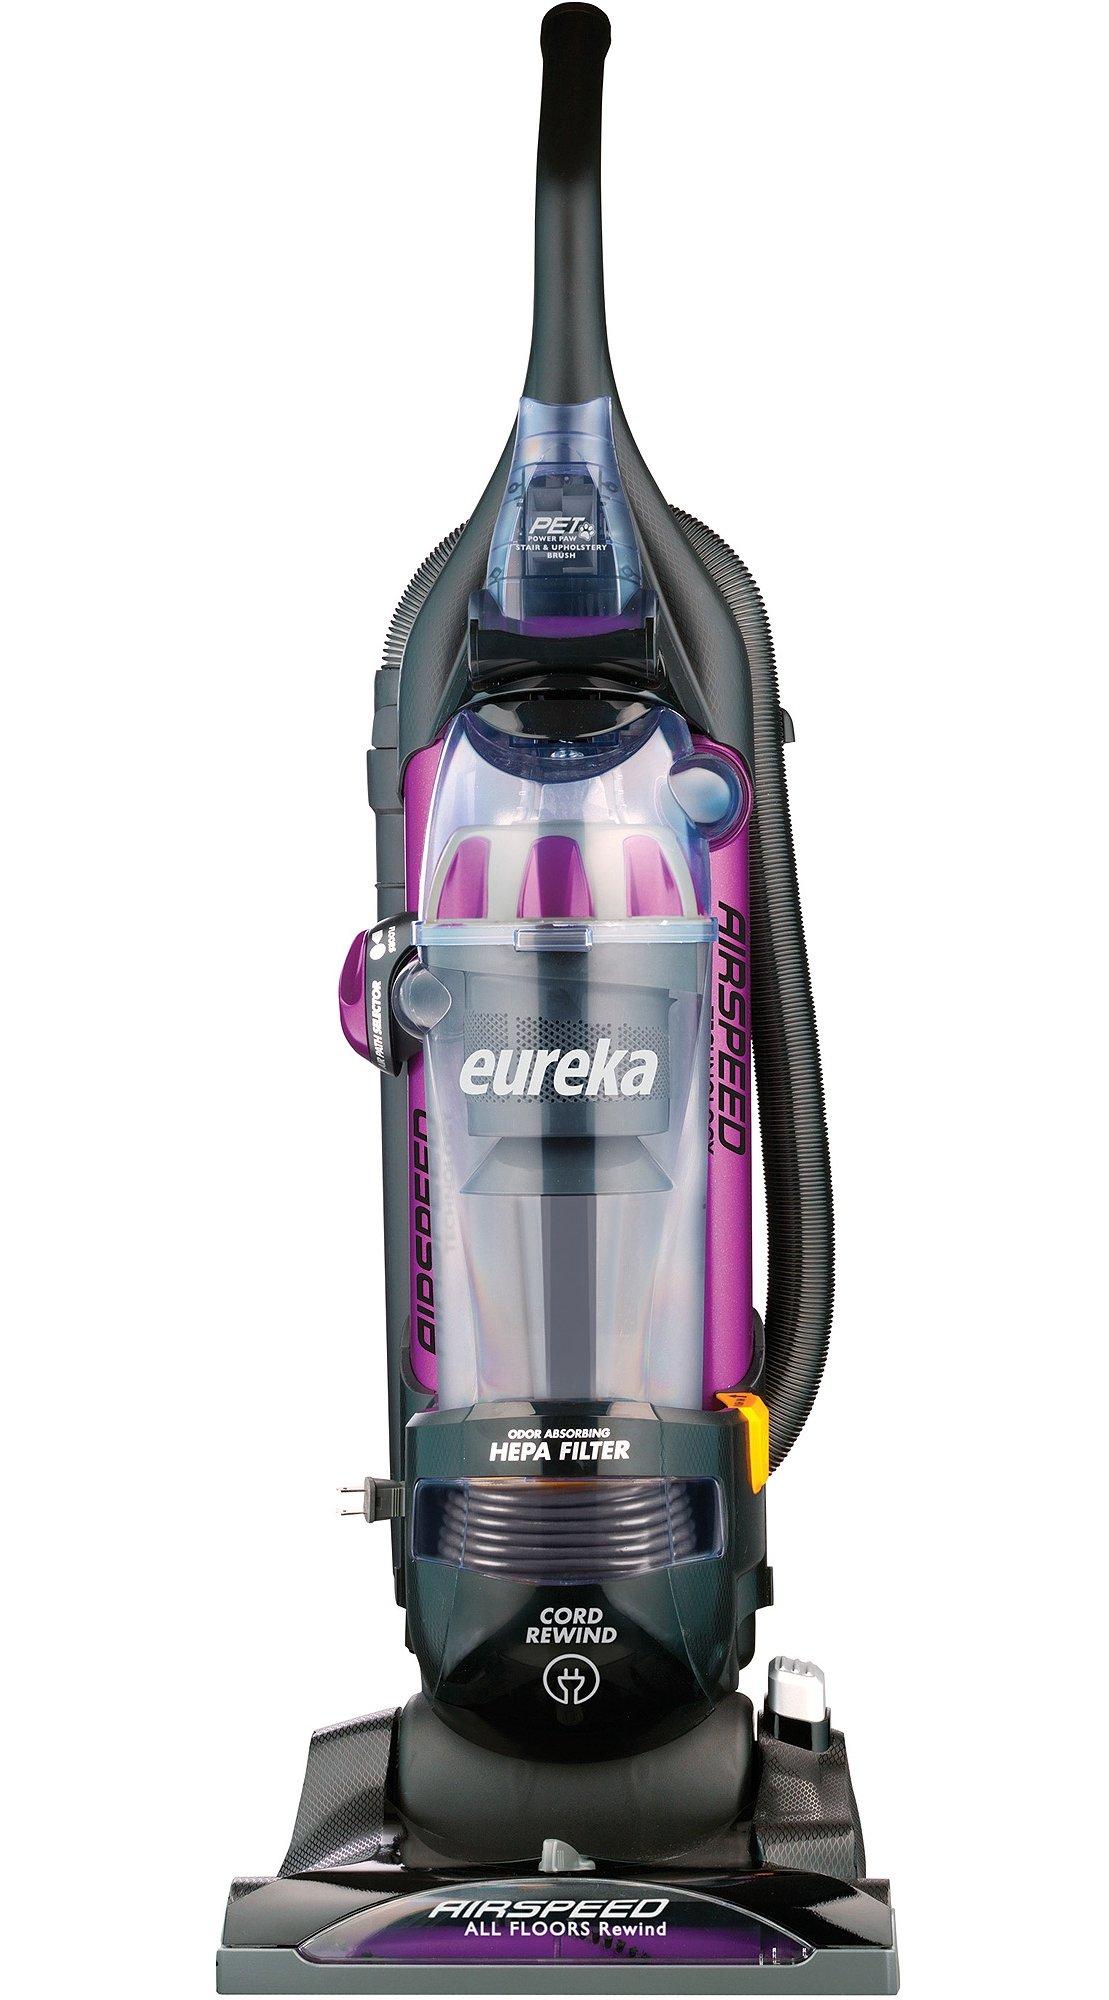 Eureka AS1061A Pro Pet Bagless Upright Vacuum, Purple